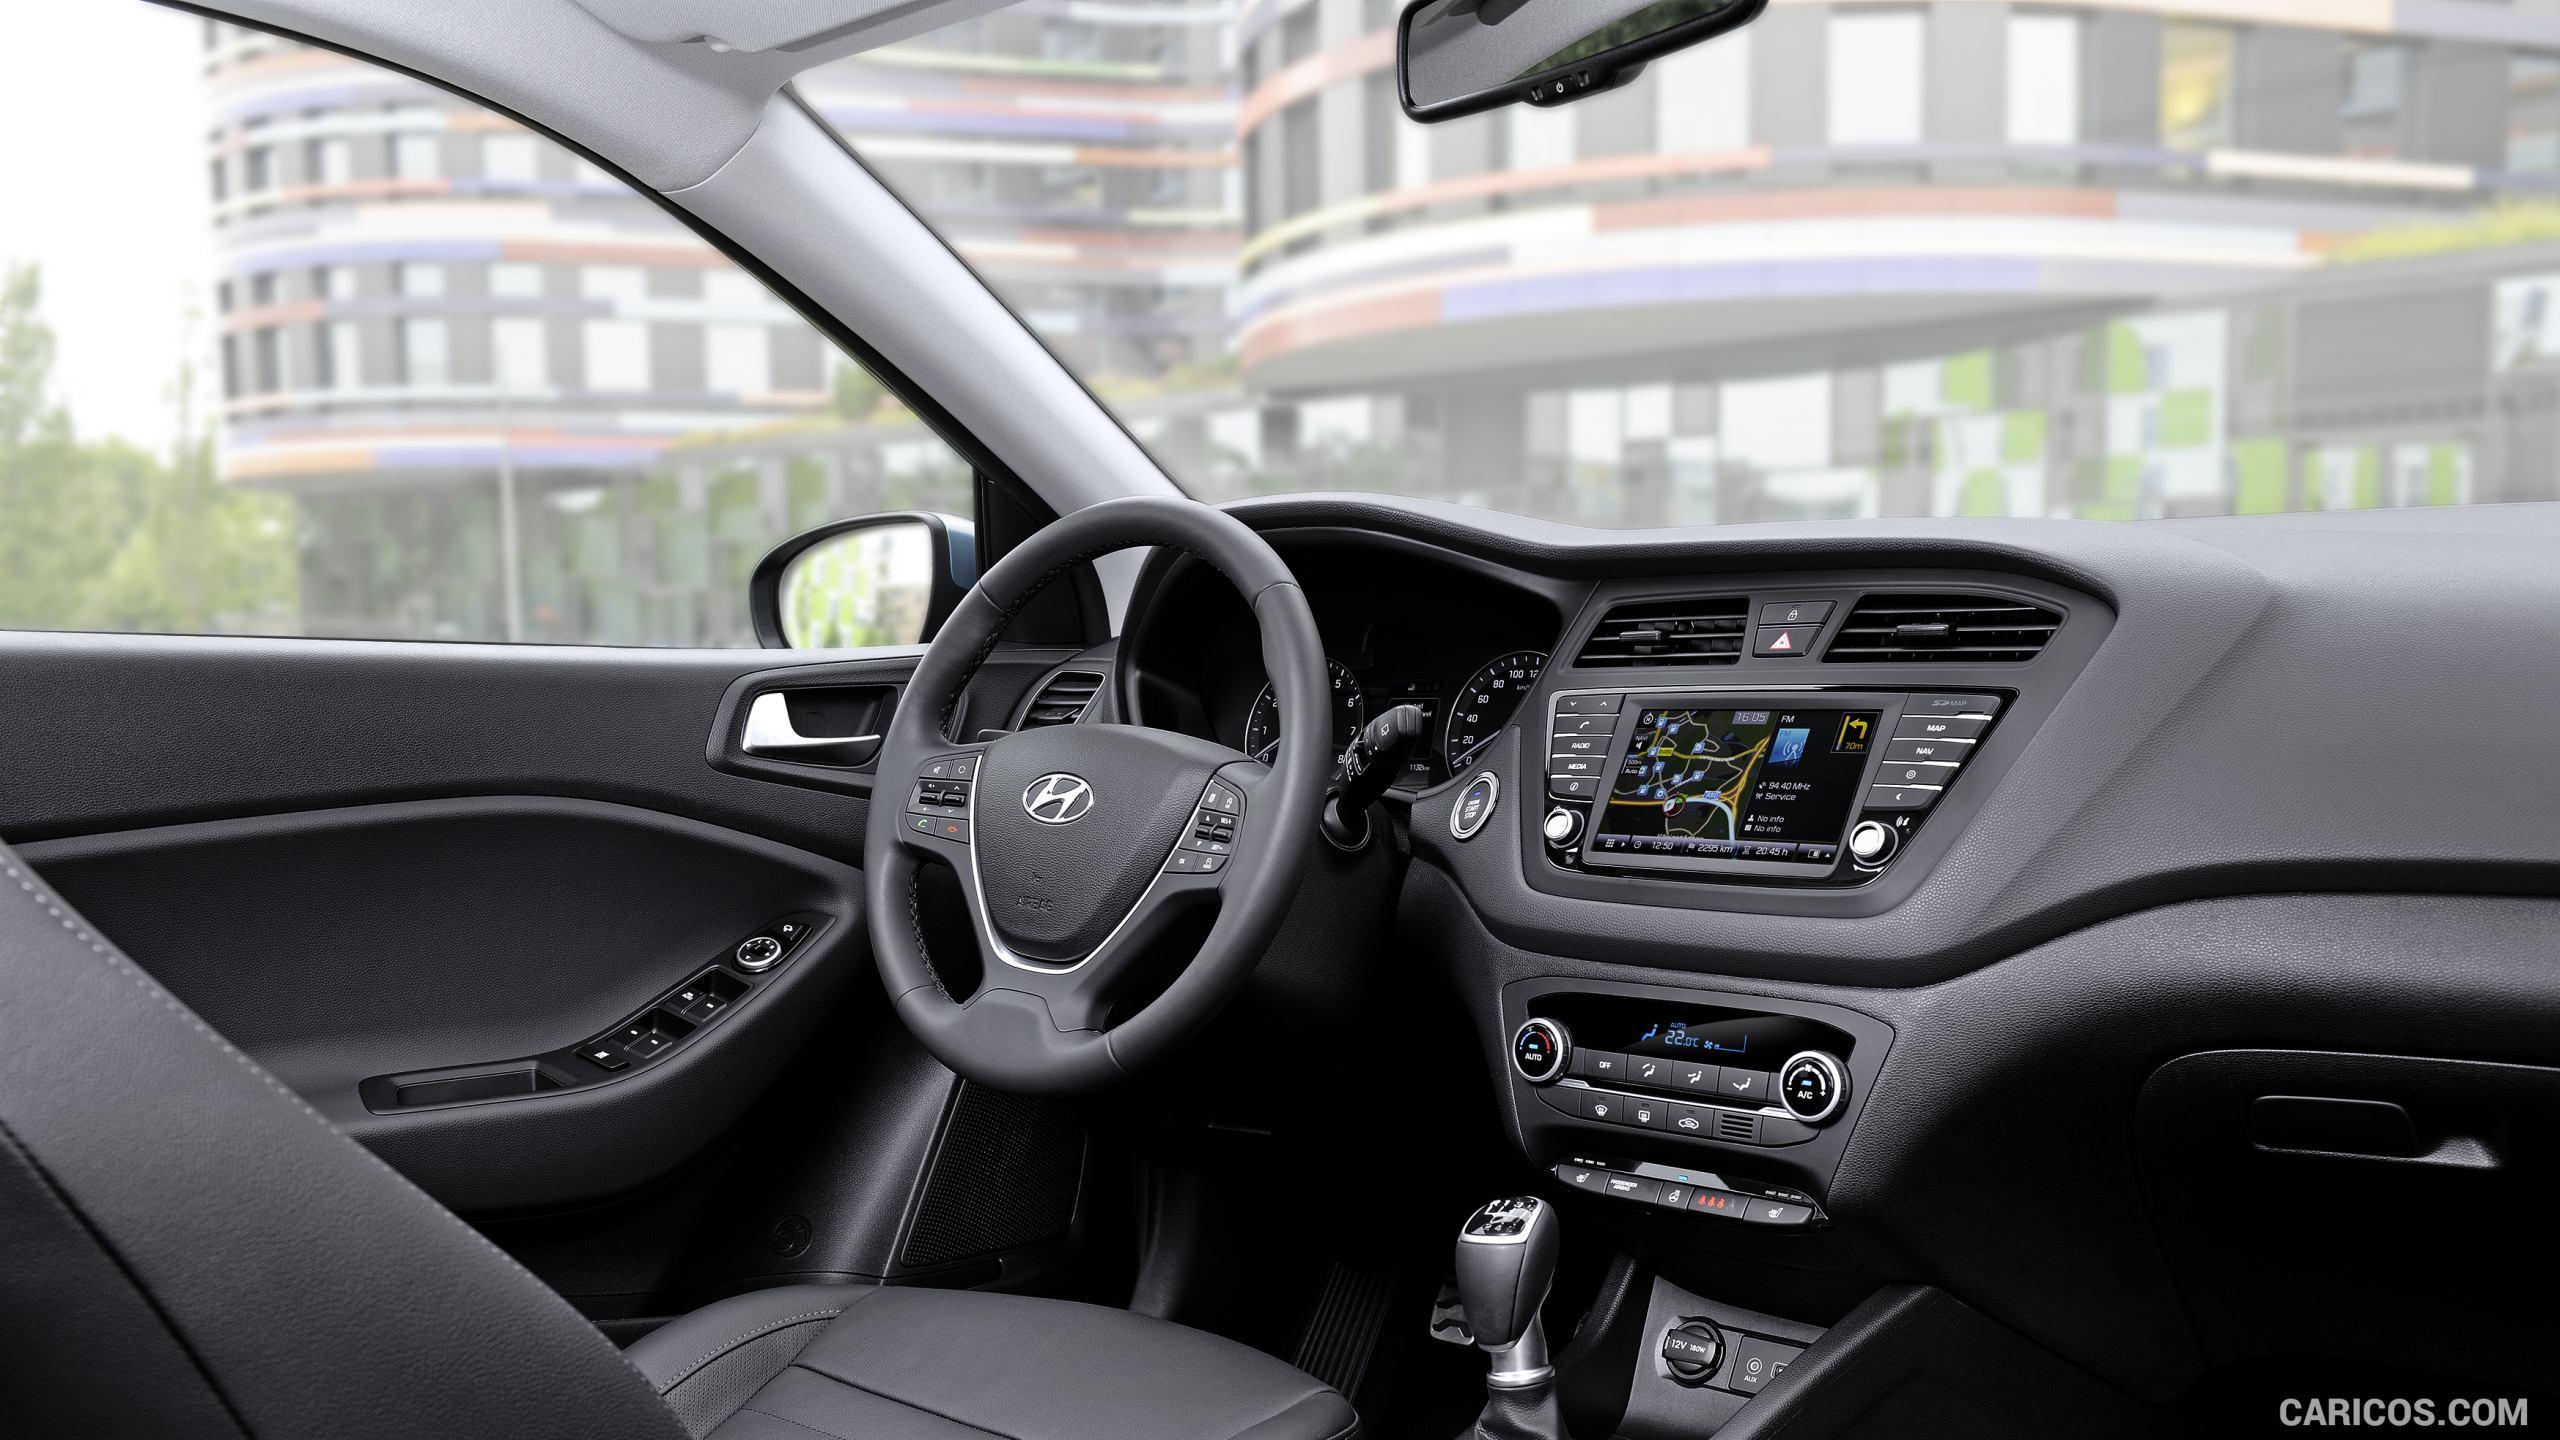 2016 Hyundai i20 Active   Interior HD Wallpaper 3 2560x1440